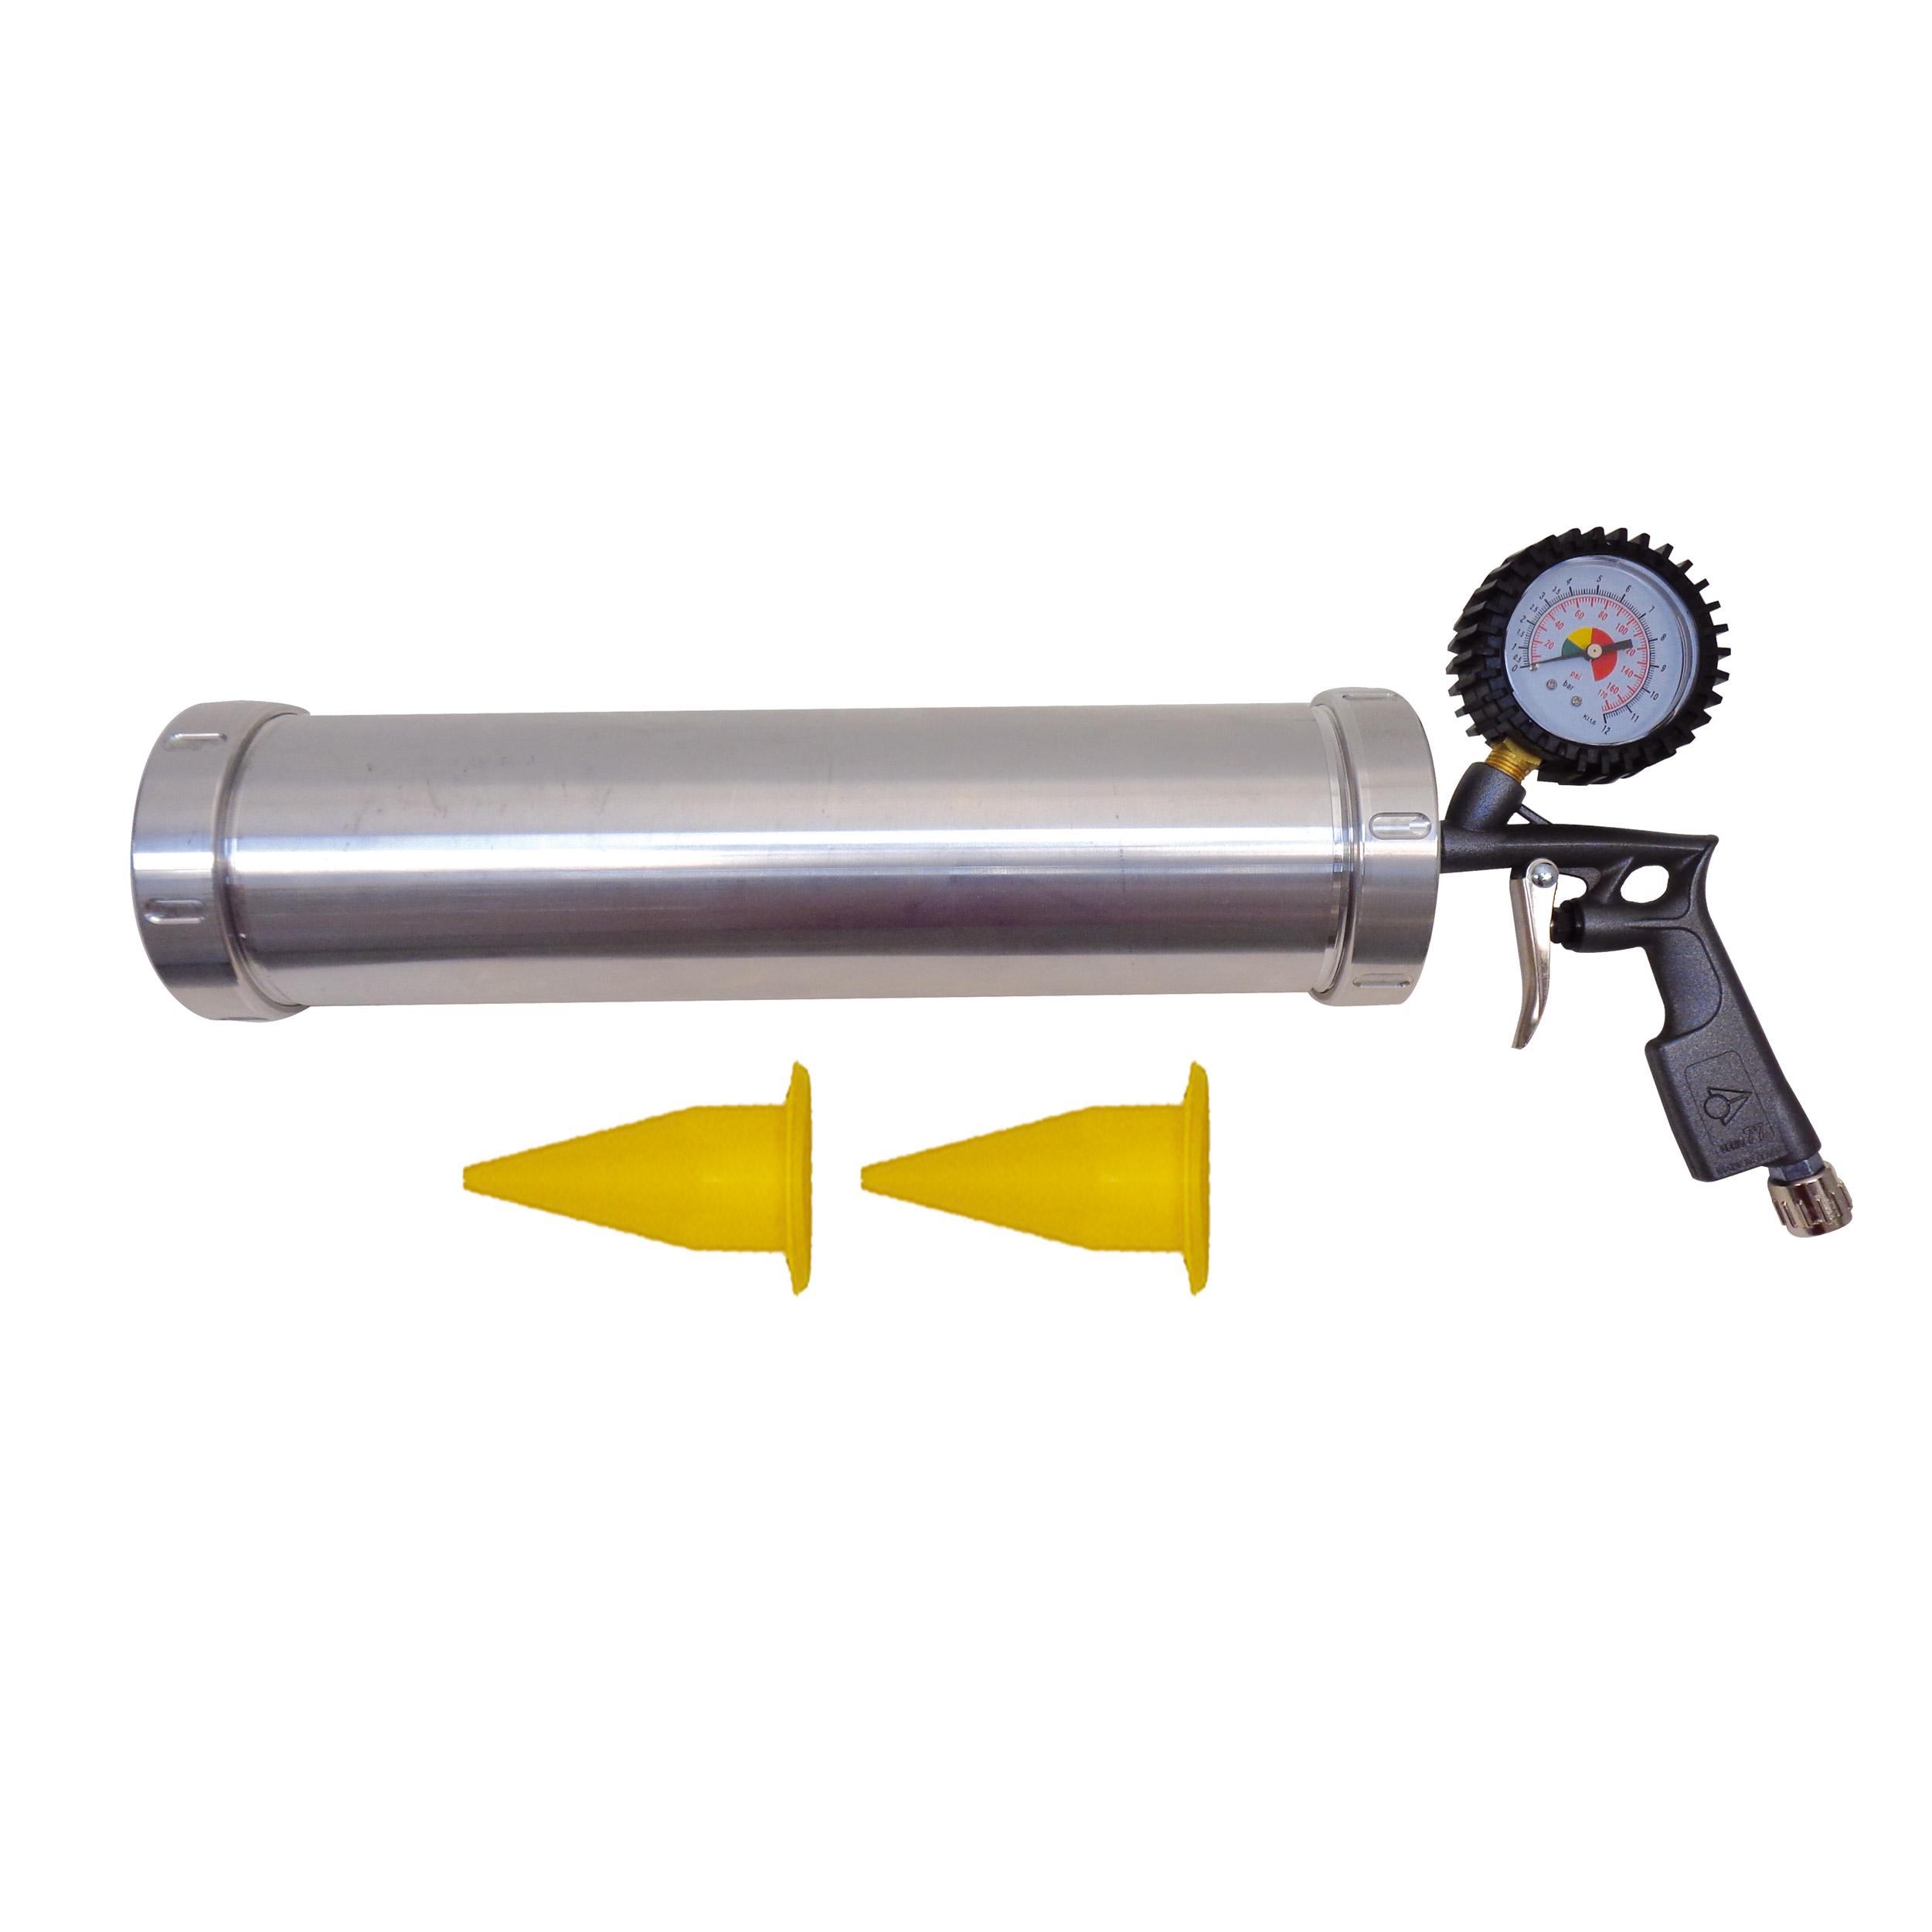 Pistola Estrusore Pneumatica